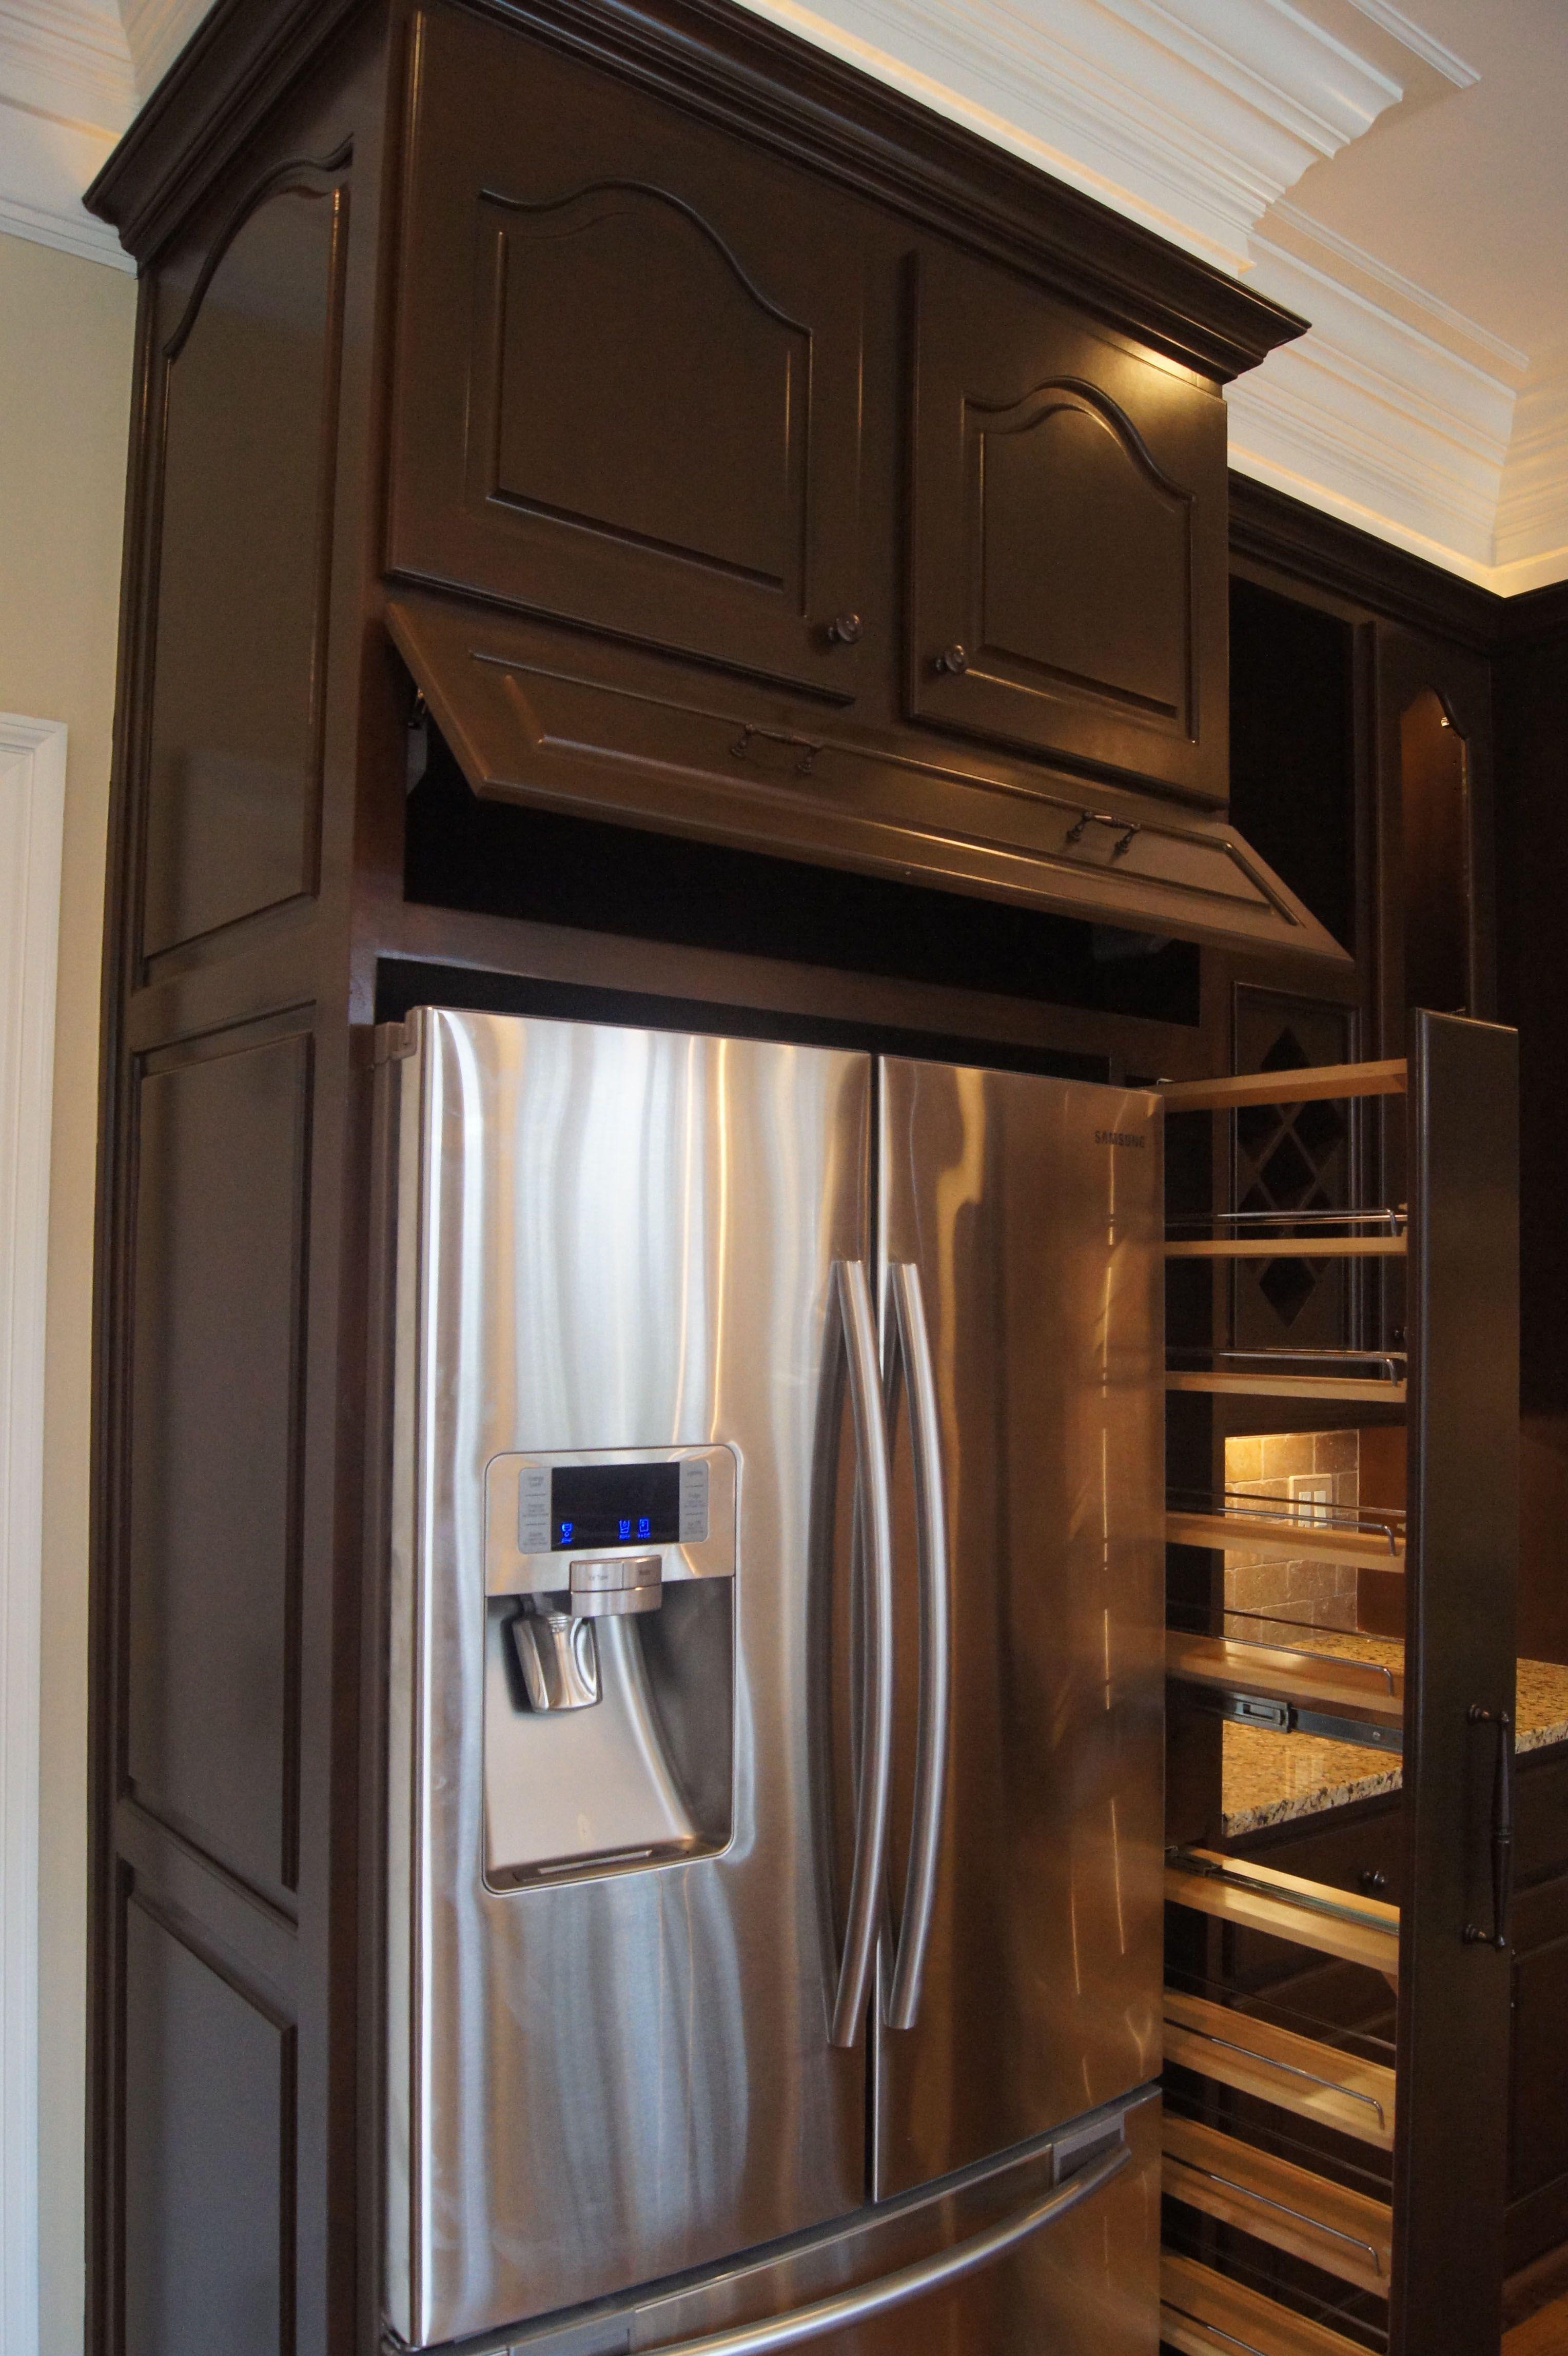 Home Ccff Organizing Inserts Fridge Storage Kitchen